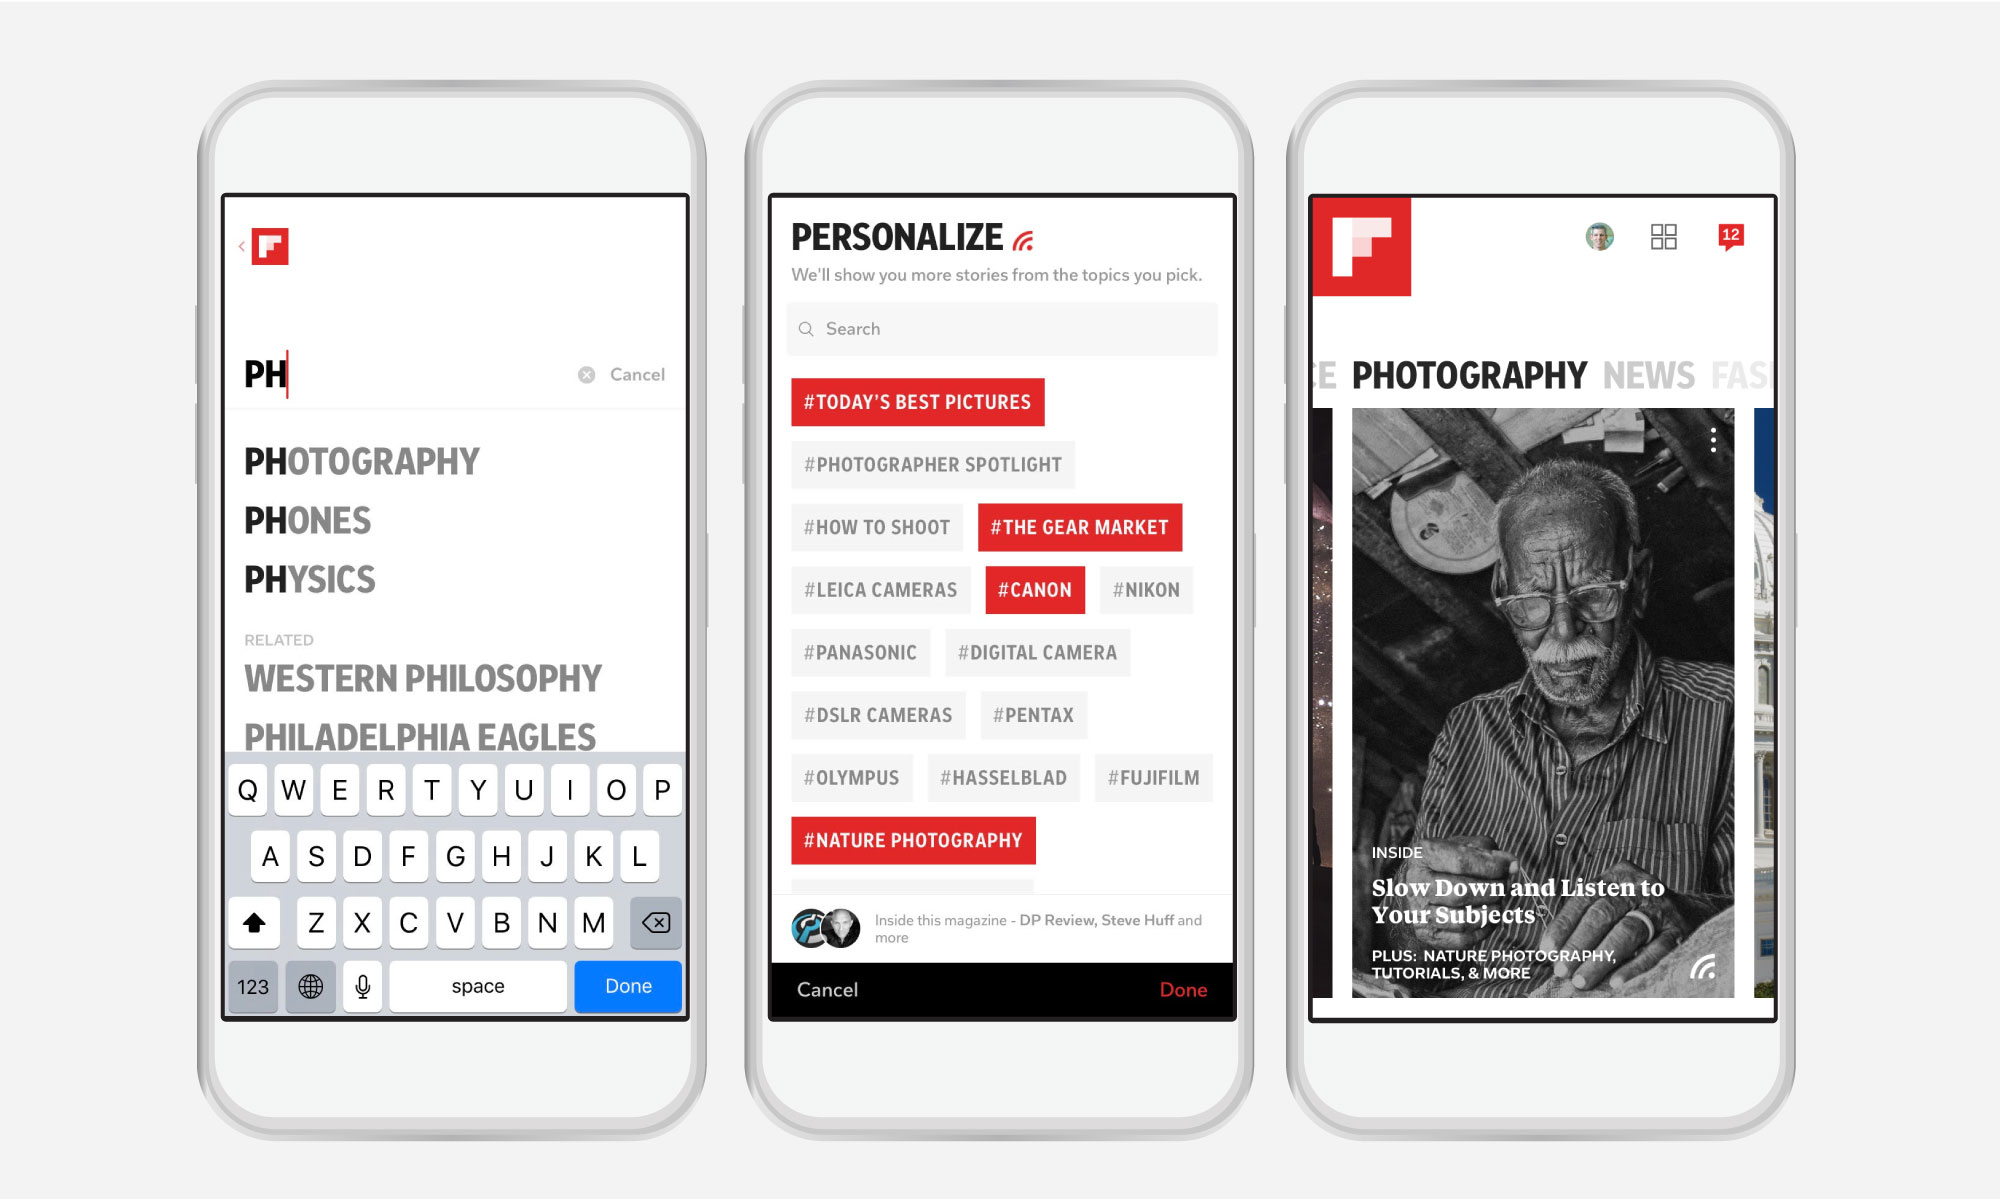 Flipboard's new passion picker interface